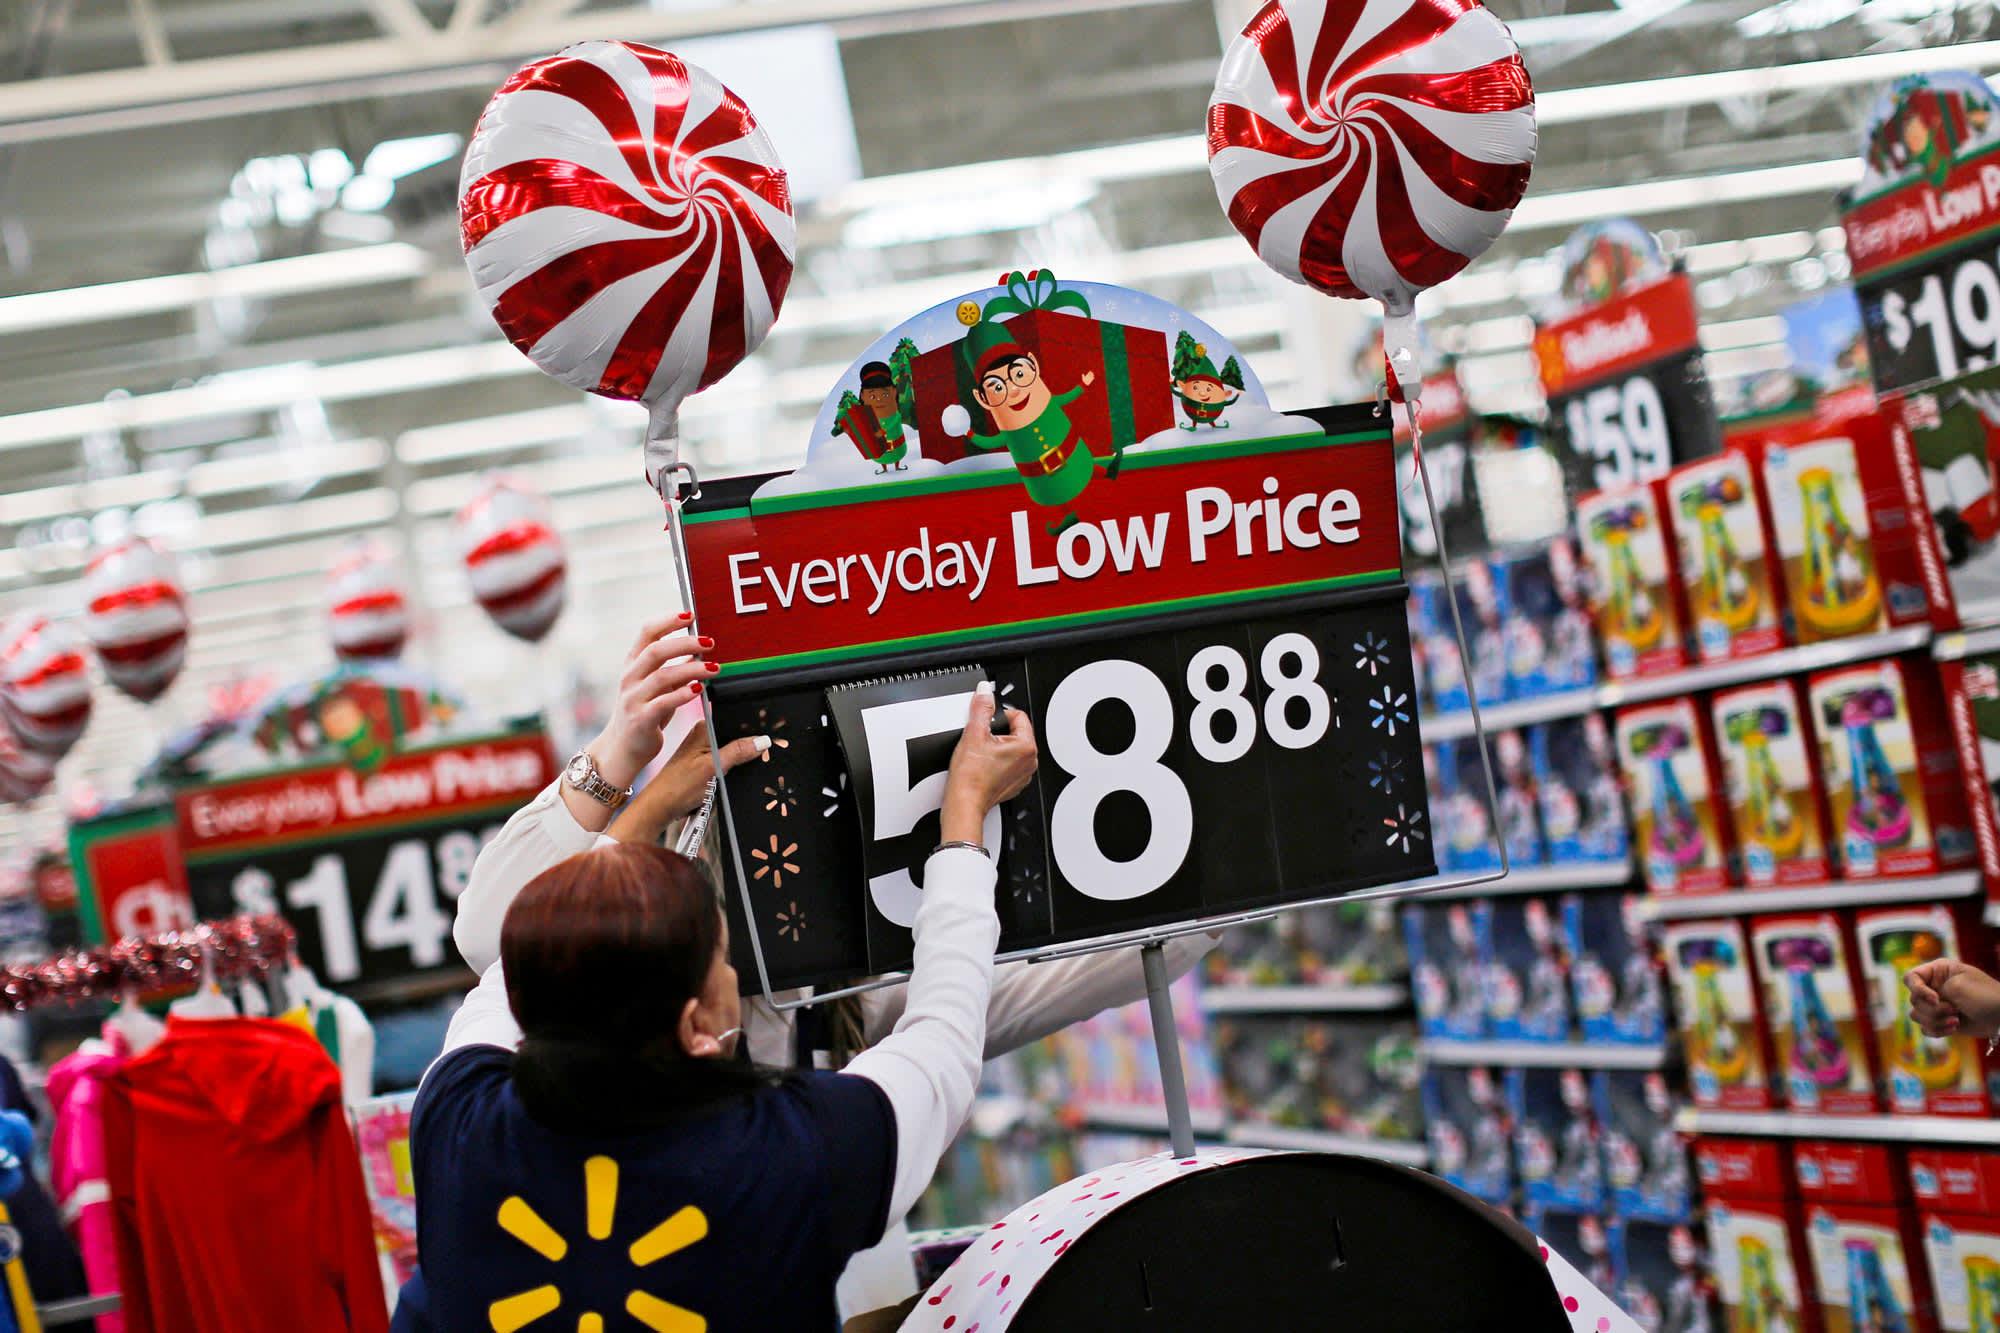 Amazon's minimum wage hike puts pressure on Walmart, Target to follow